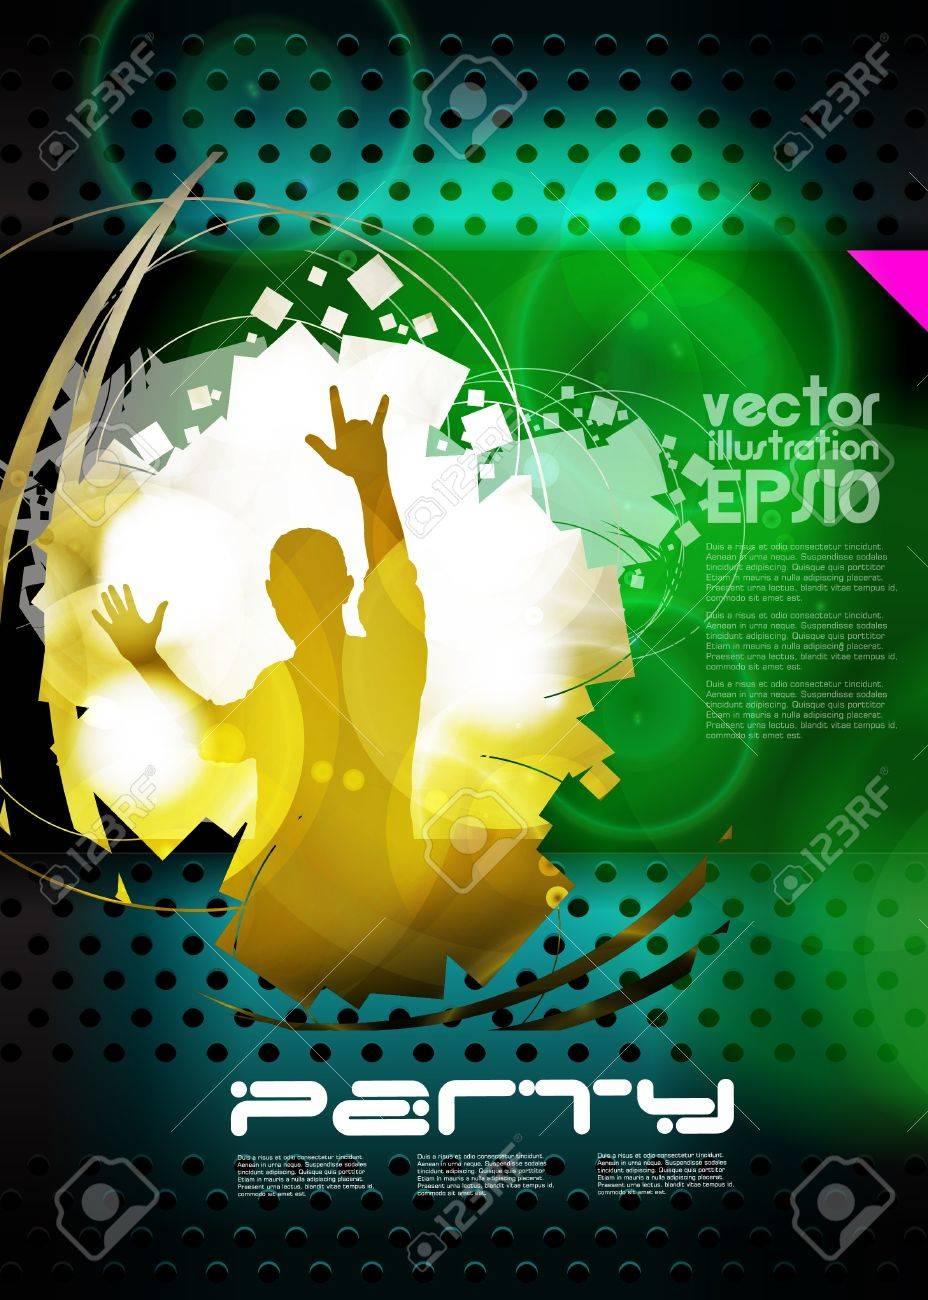 Music event background for poster. Vector eps10 illustration - 20046099